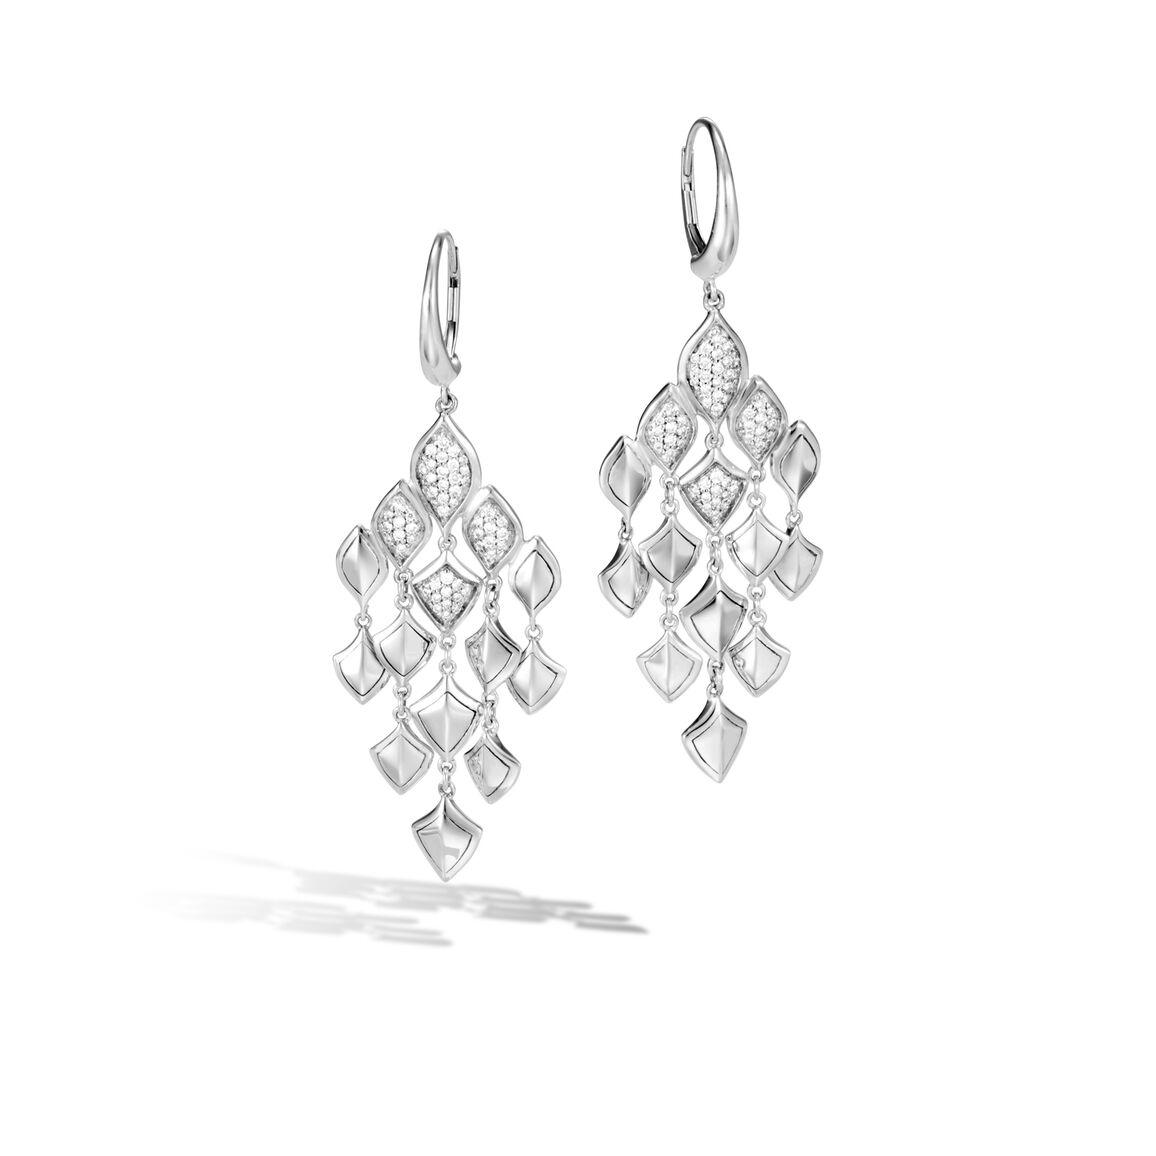 Legends Naga Chandelier Earring in Silver with Diamonds